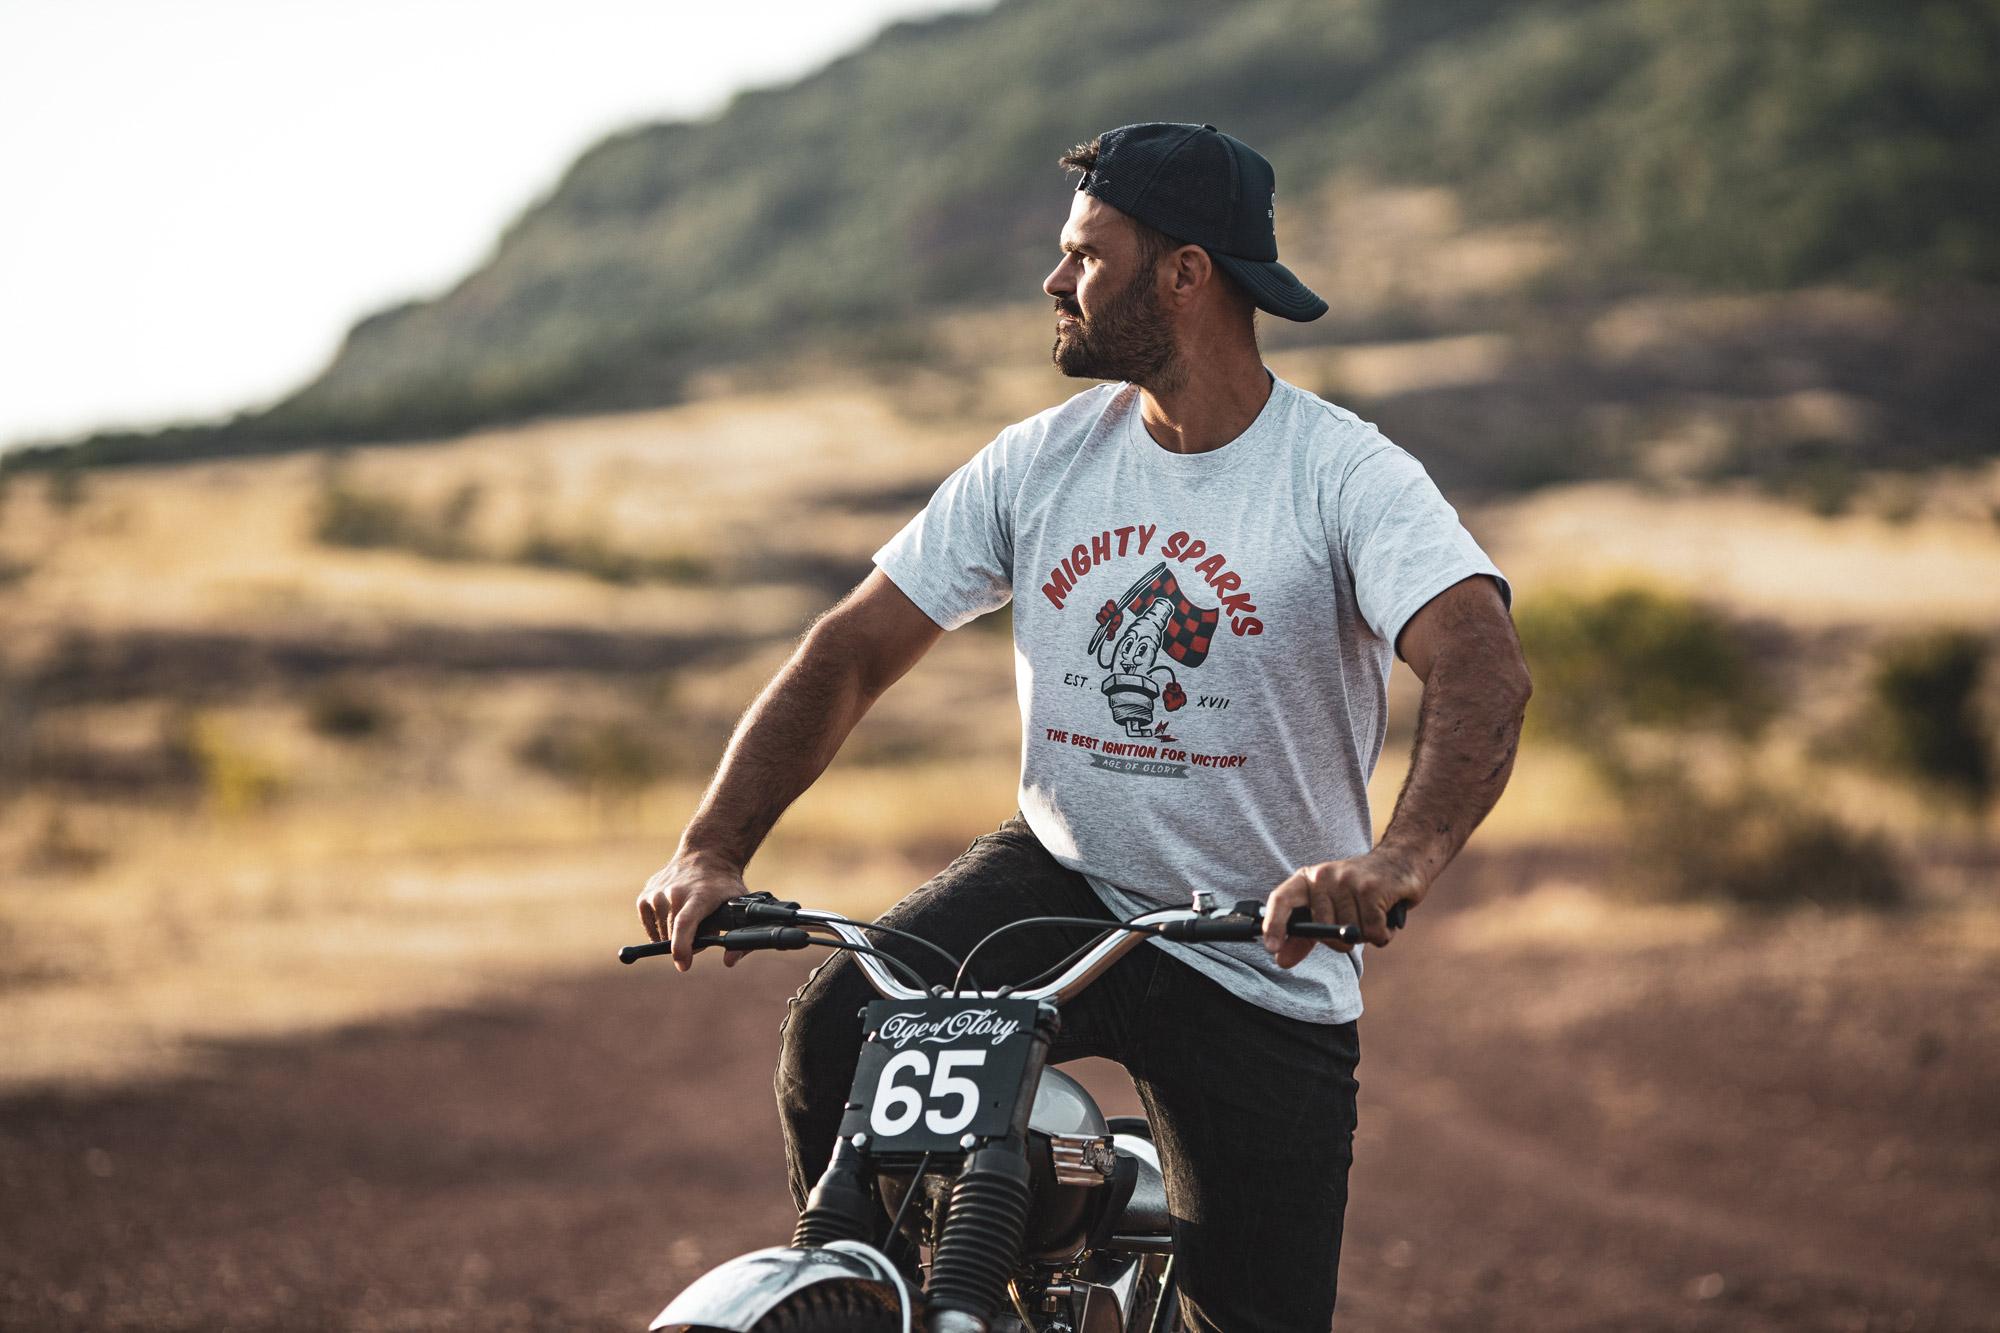 age of glory moto flat track